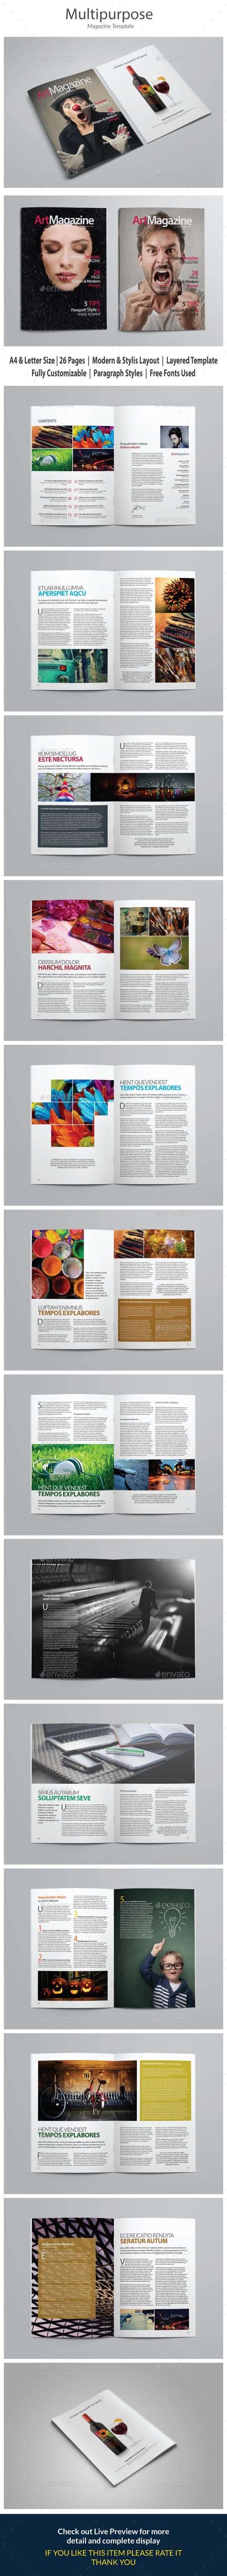 Indesign Magazine Template vol 4 - Magazines Print Templates